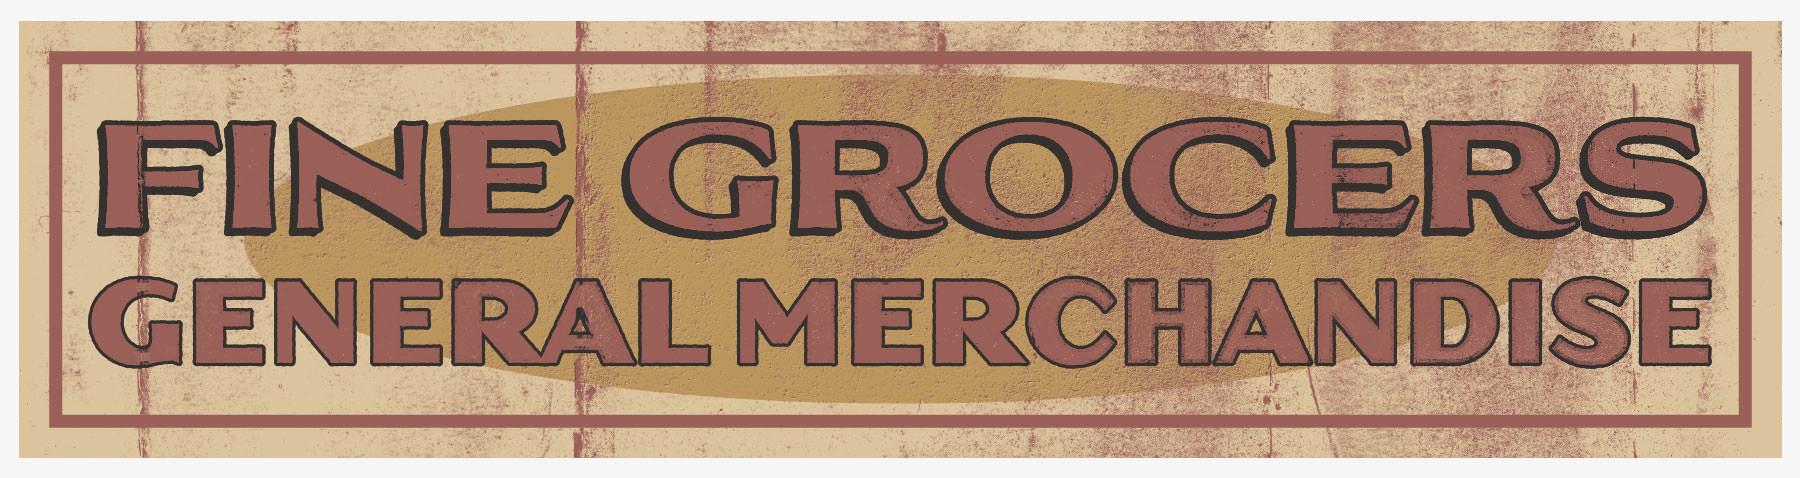 Wells Fargo Anthem - Period Signage